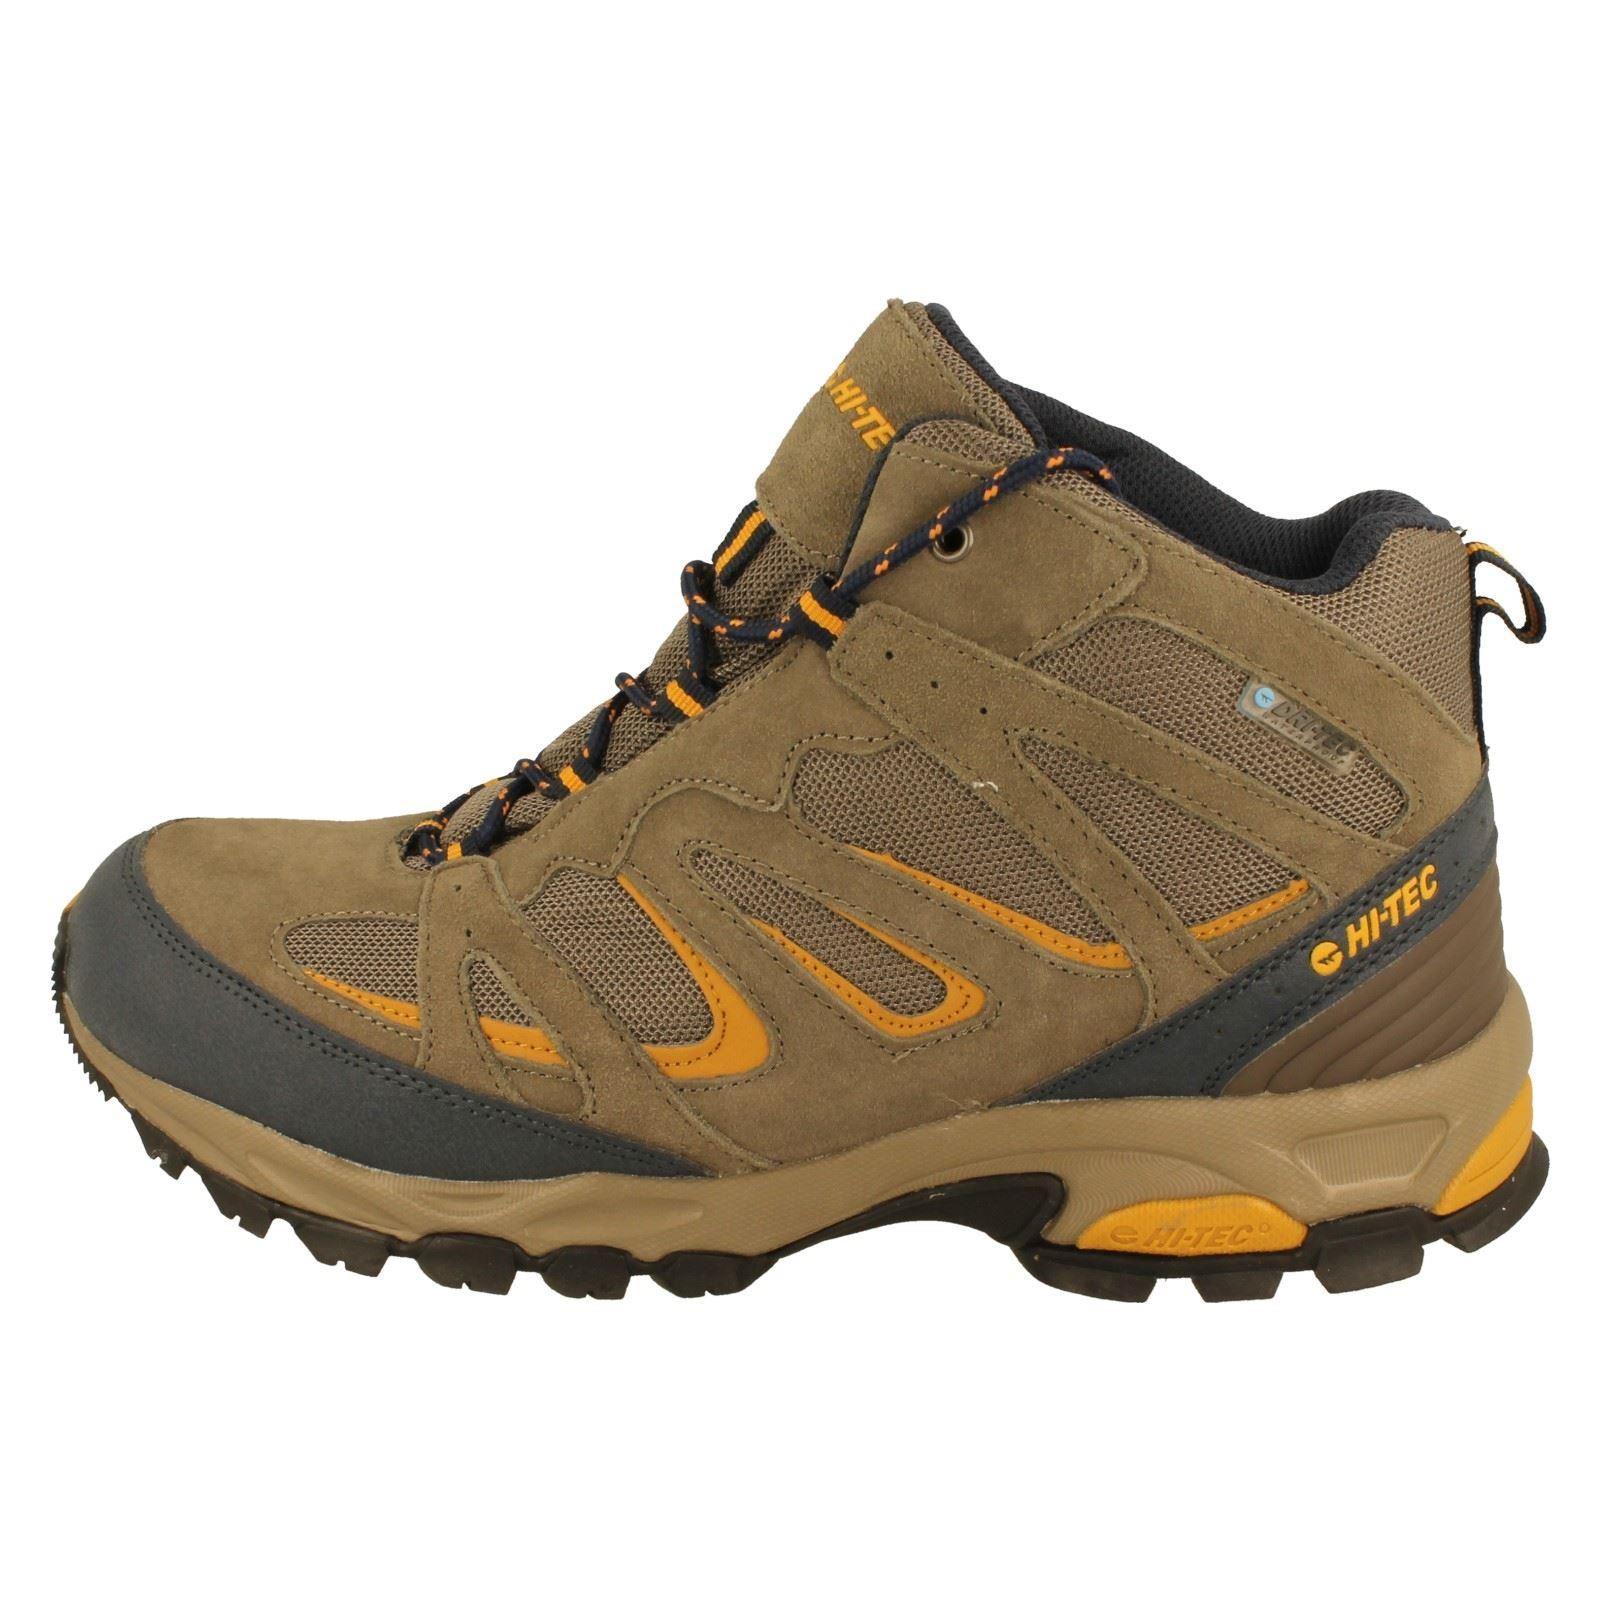 mens hi tec walking boots the style fusion sport mid wp w